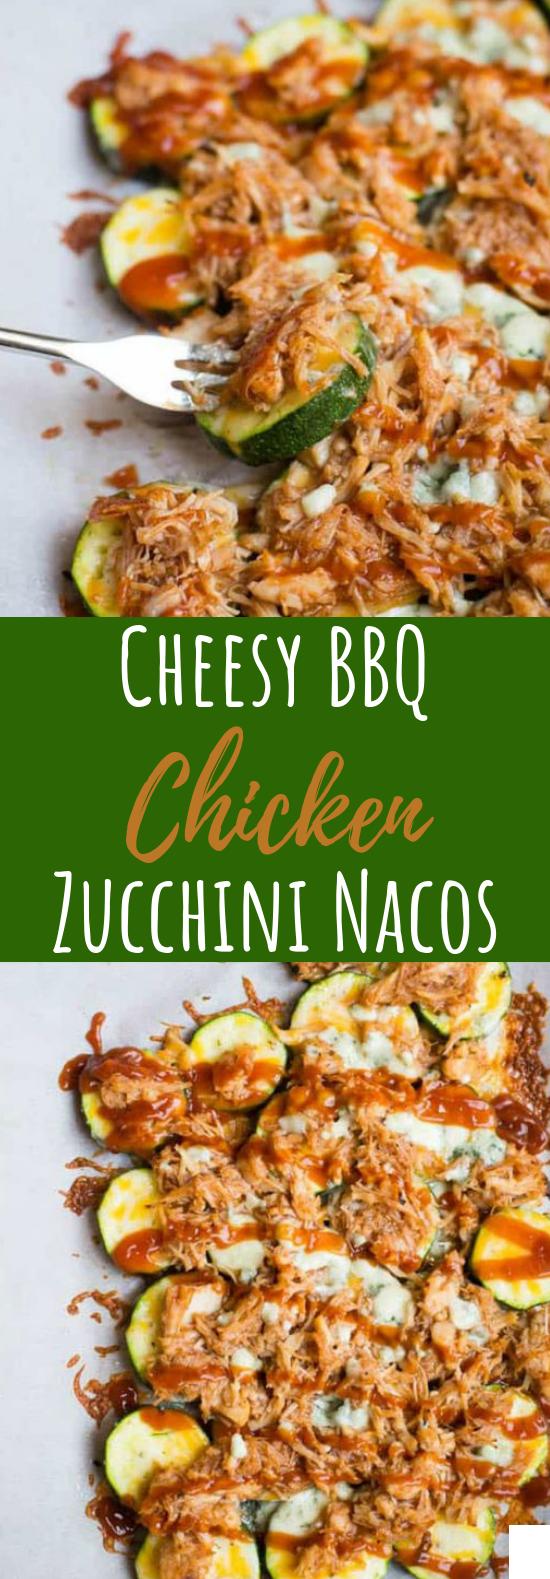 Cheesy BBQ Chicken Zucchini Nachos #healthy #lowcarb